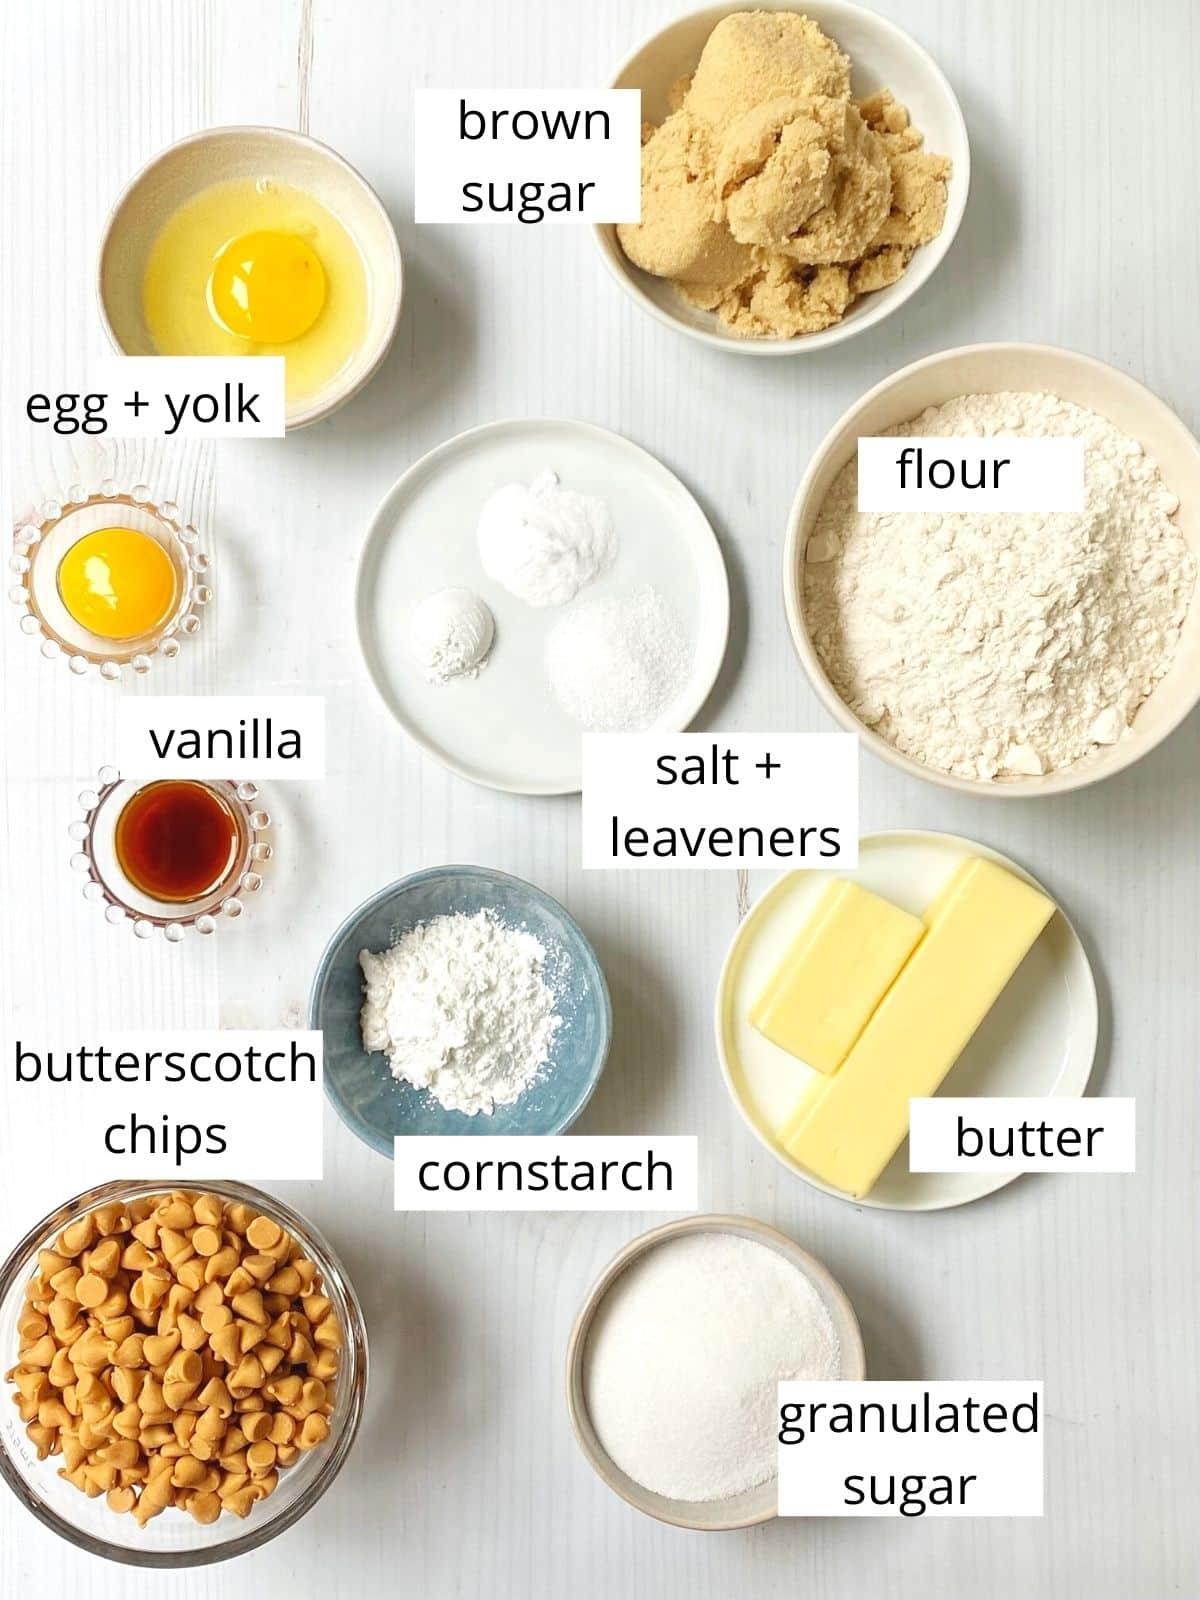 cookie dough ingredients - flour, sugars, butter, eggs, cornstarch, salt, leaveners, vanilla, butterscotch chips